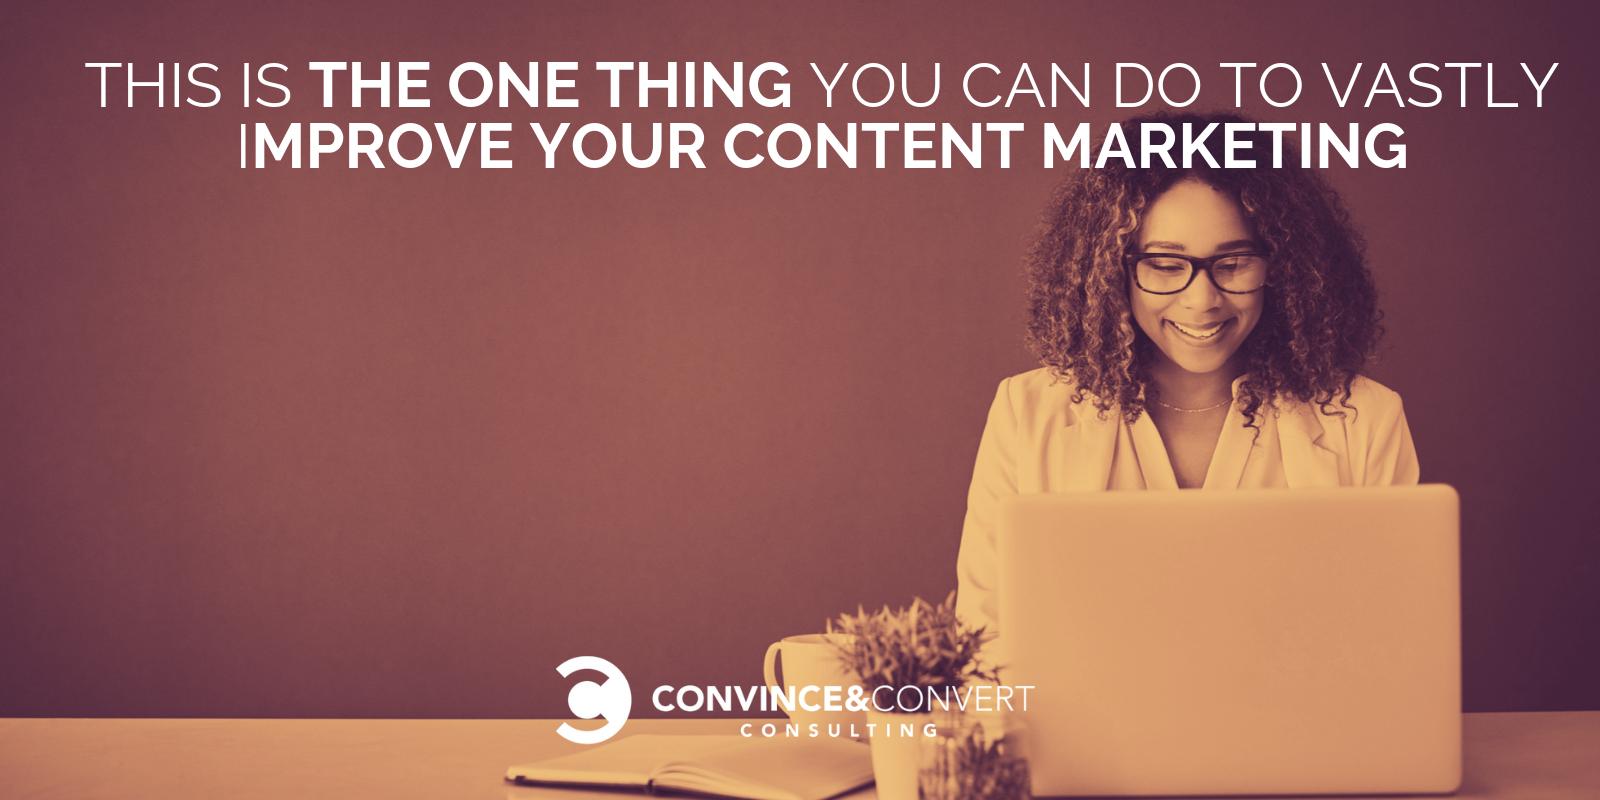 vastly improve content marketing